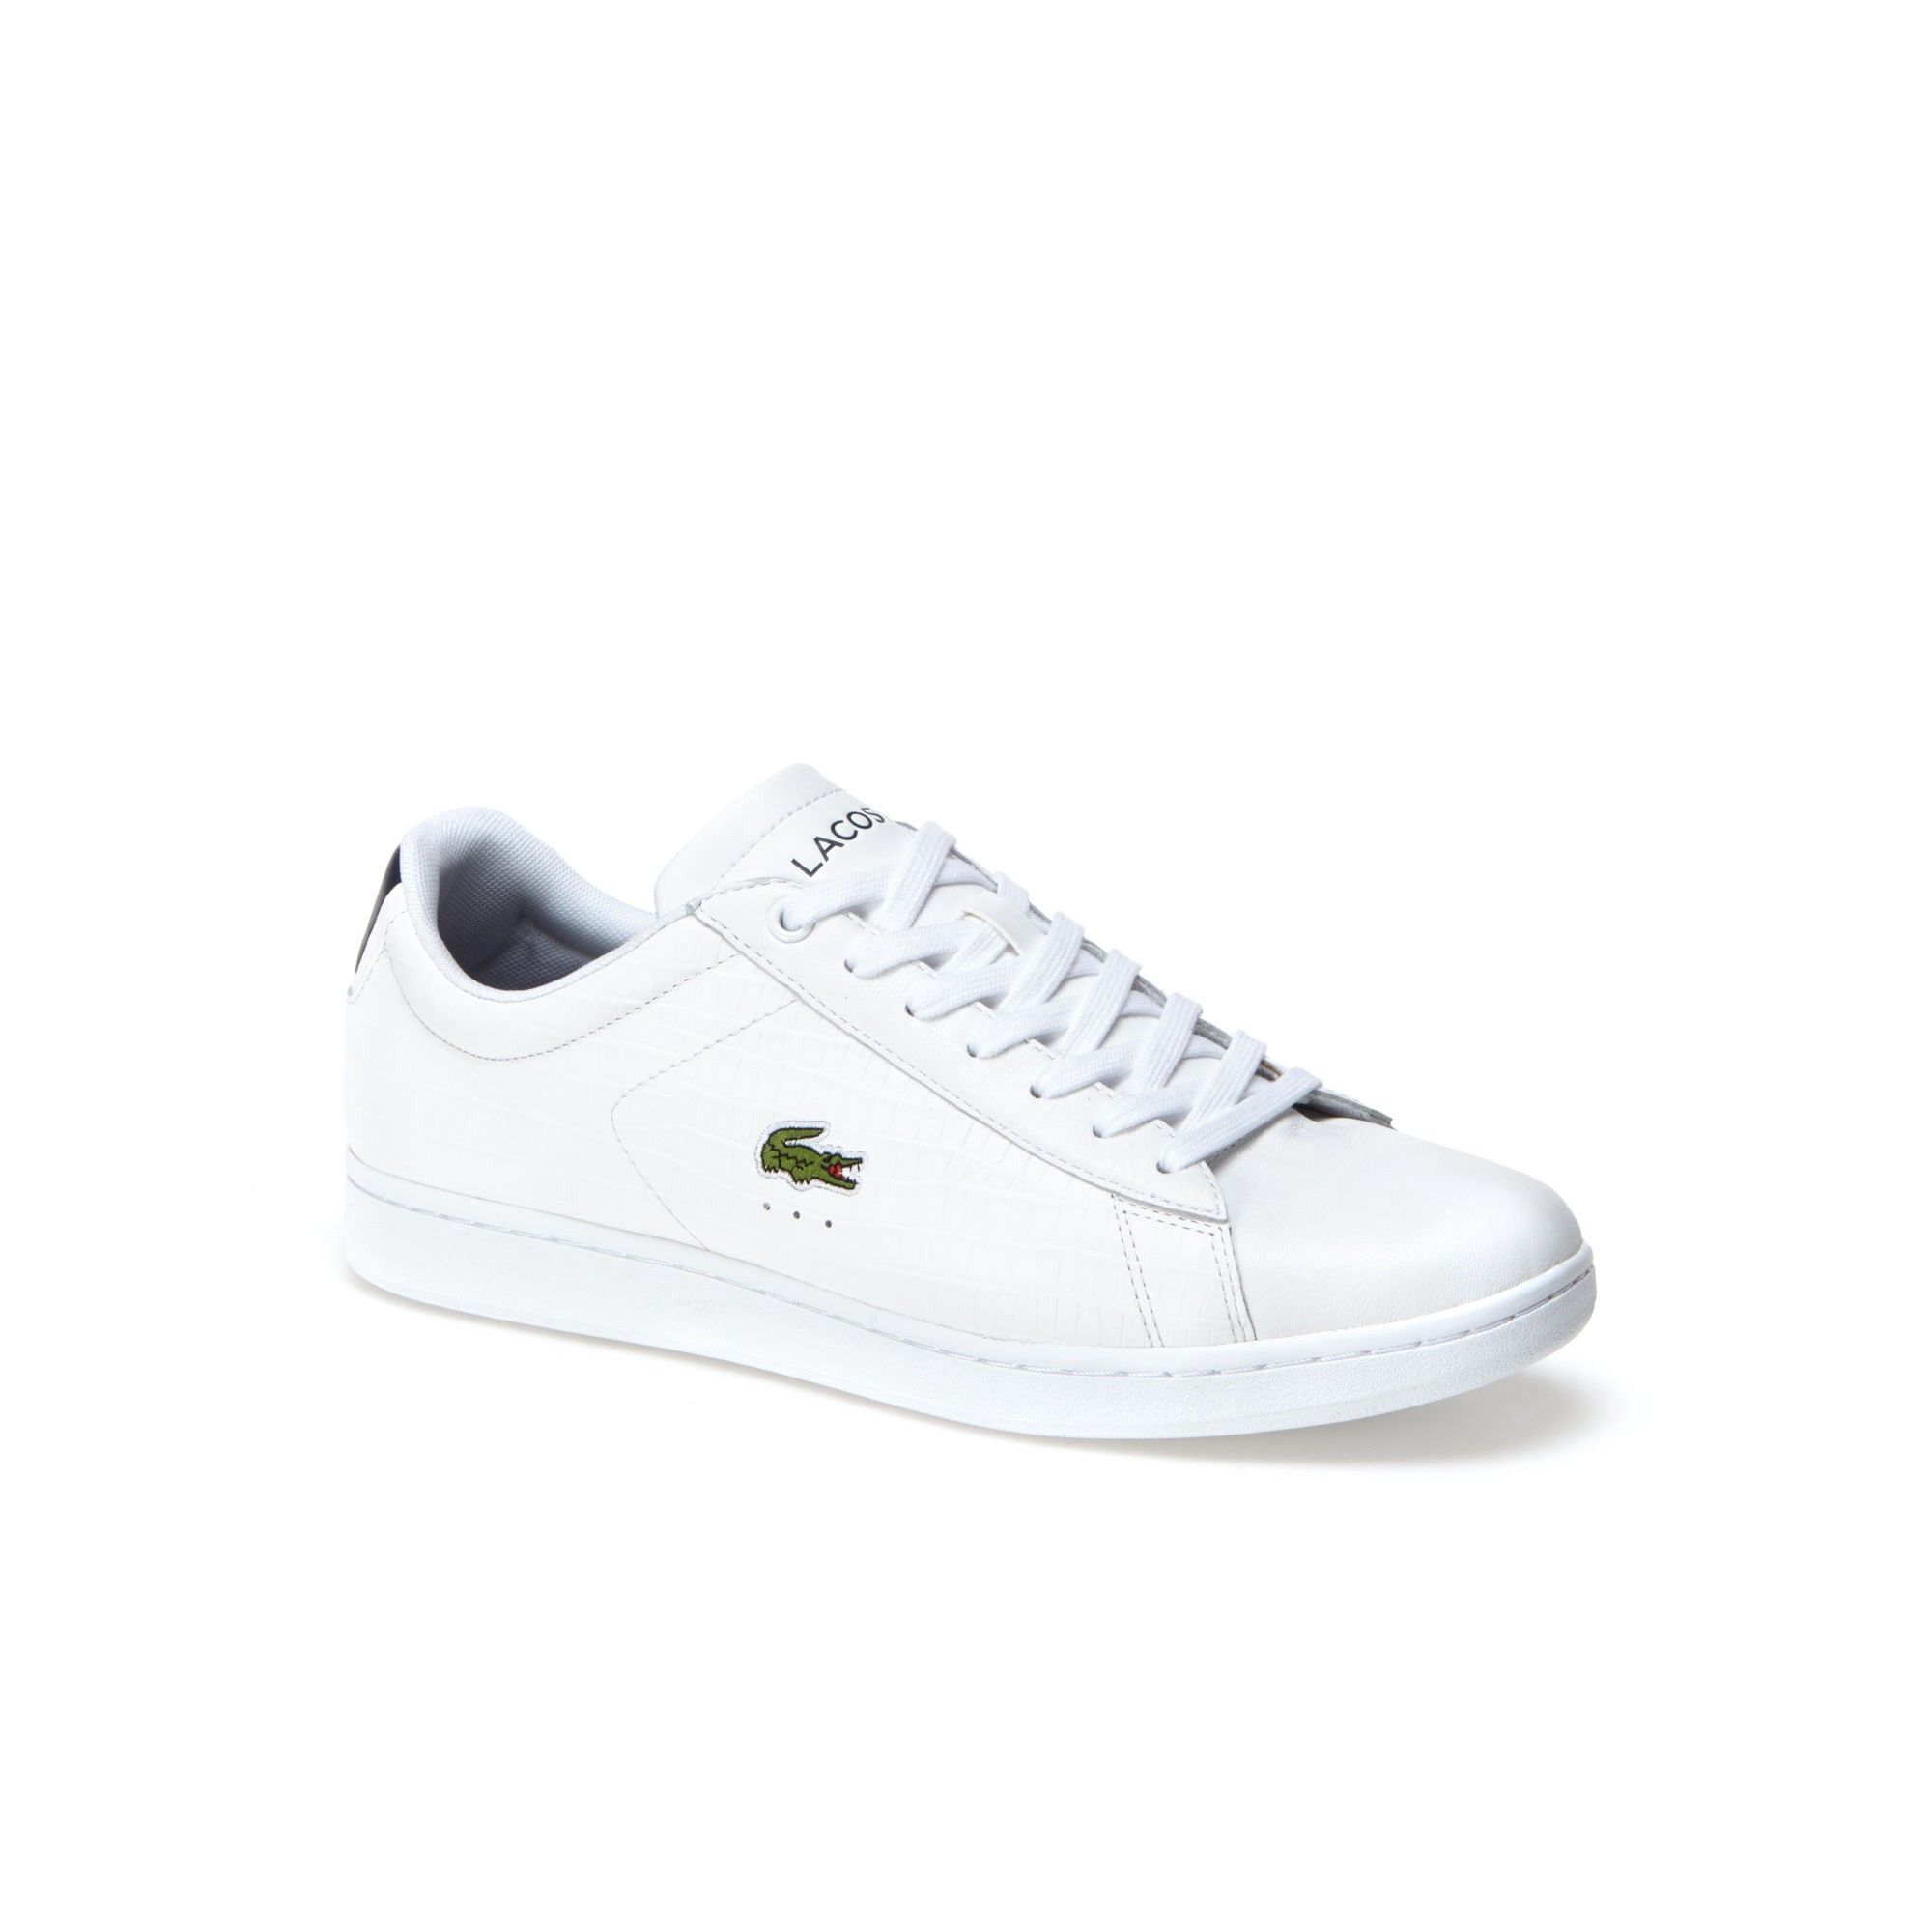 super popular a8439 0ac6f LACOSTE Men's Carnaby Evo Low-Rise Contrast Heel Sneakers ...